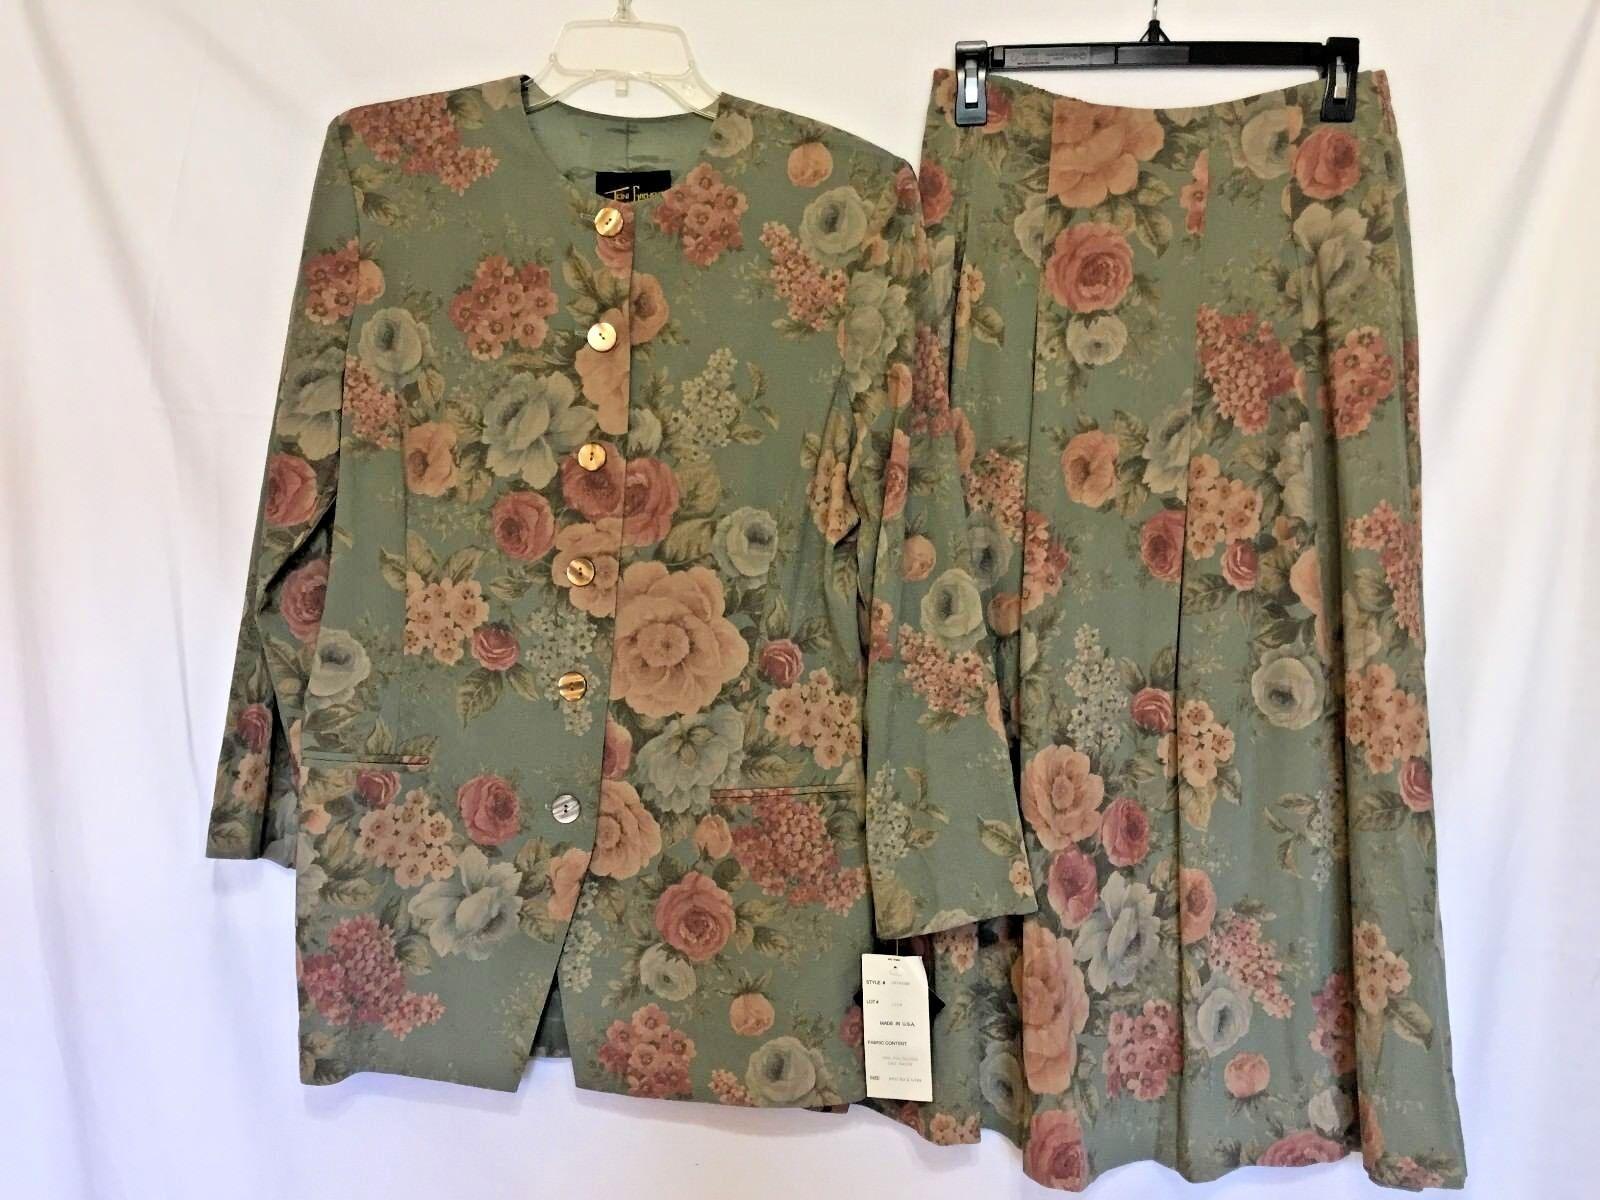 NWT  TONI GARMENT FOR C.C.MAGIC Green w Flowers Mid-Calf Skirt Suit Sz.M 10